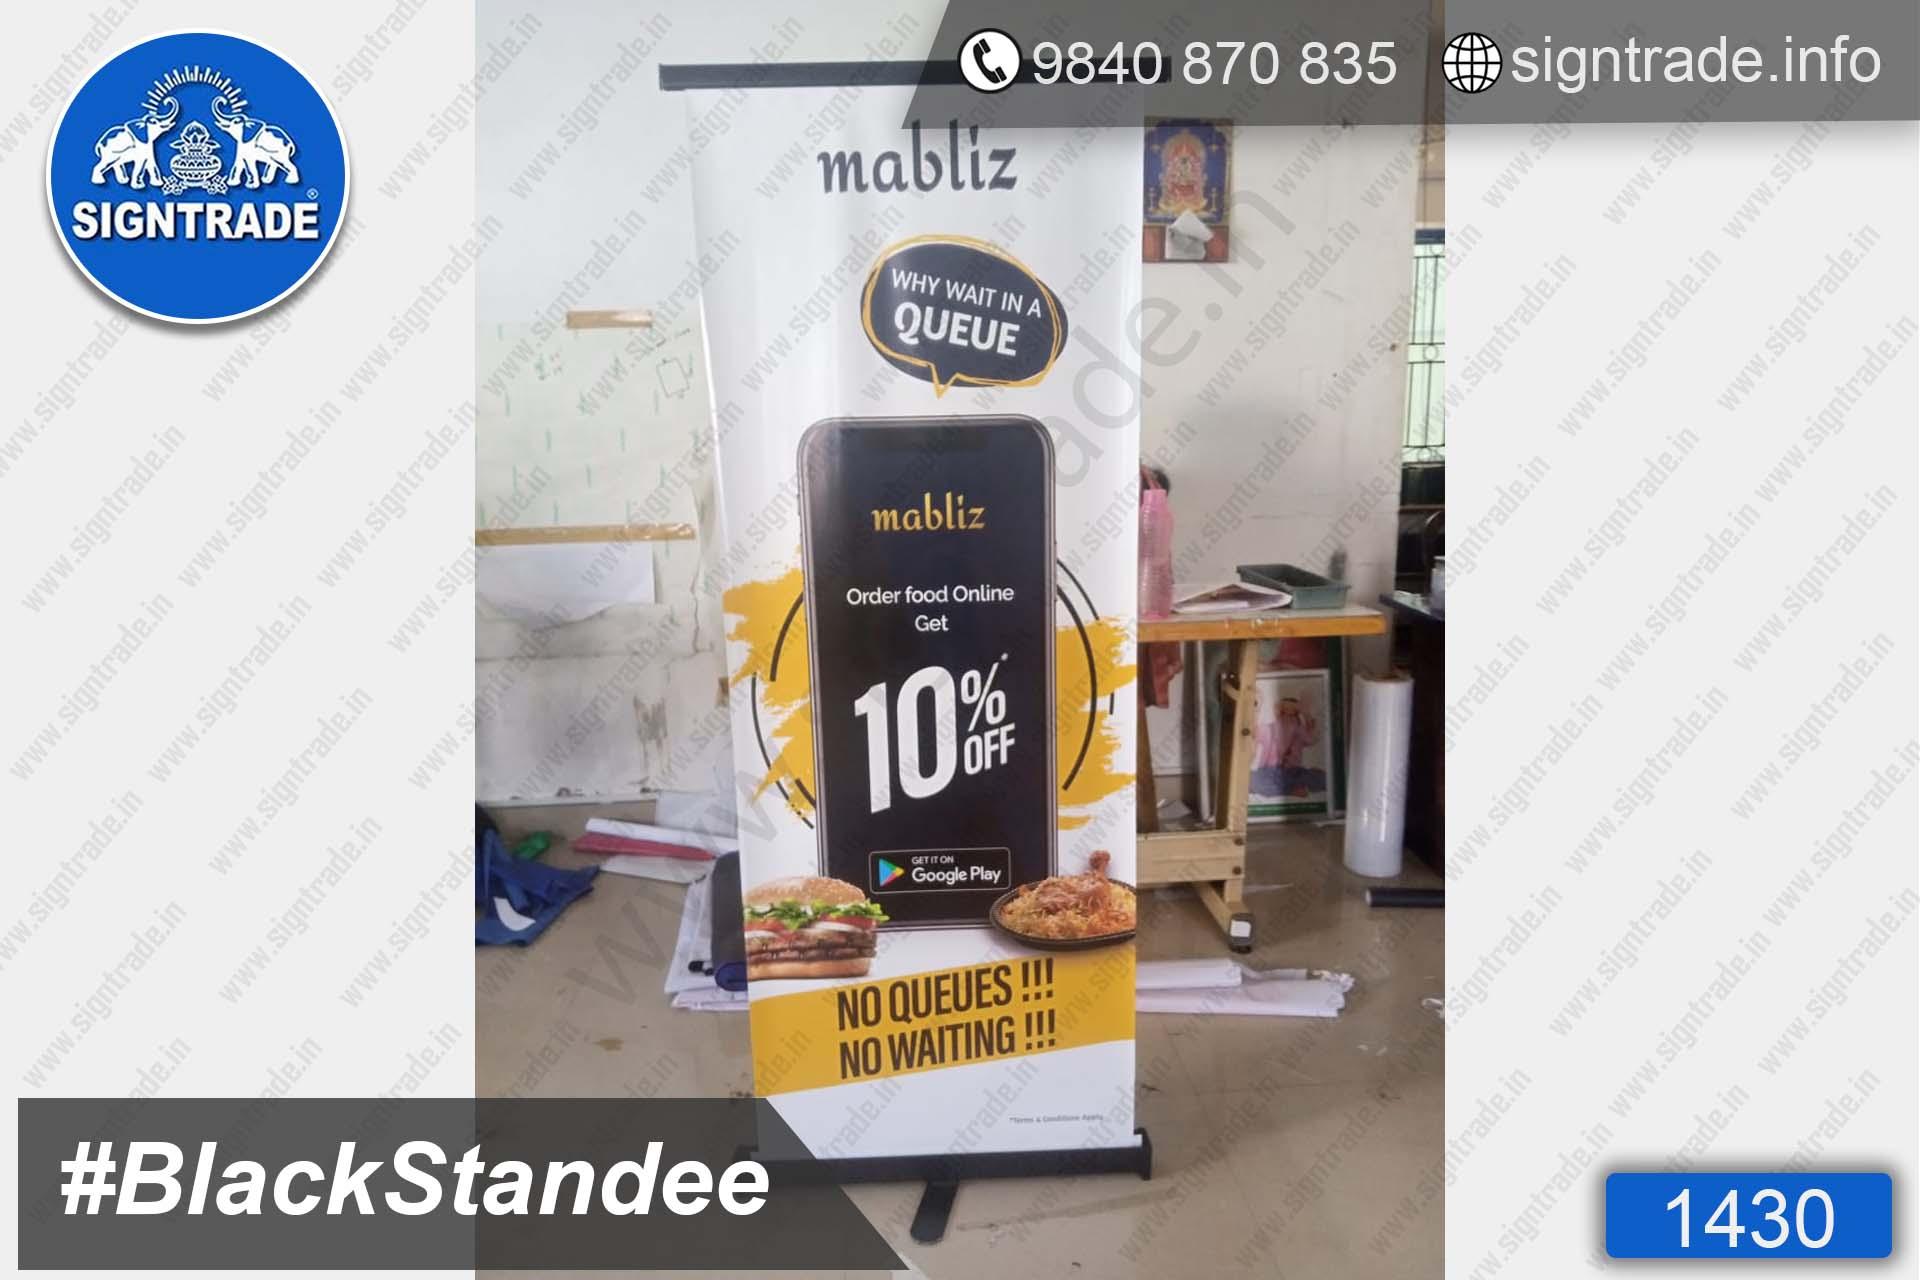 1430, Black Standee, Retractable Banner, Roll Up Banner Stand, Banner Stand, Roll Up Banner, Standee, Promotional Standee, Promotional Roll Up Standee, Promo Standee